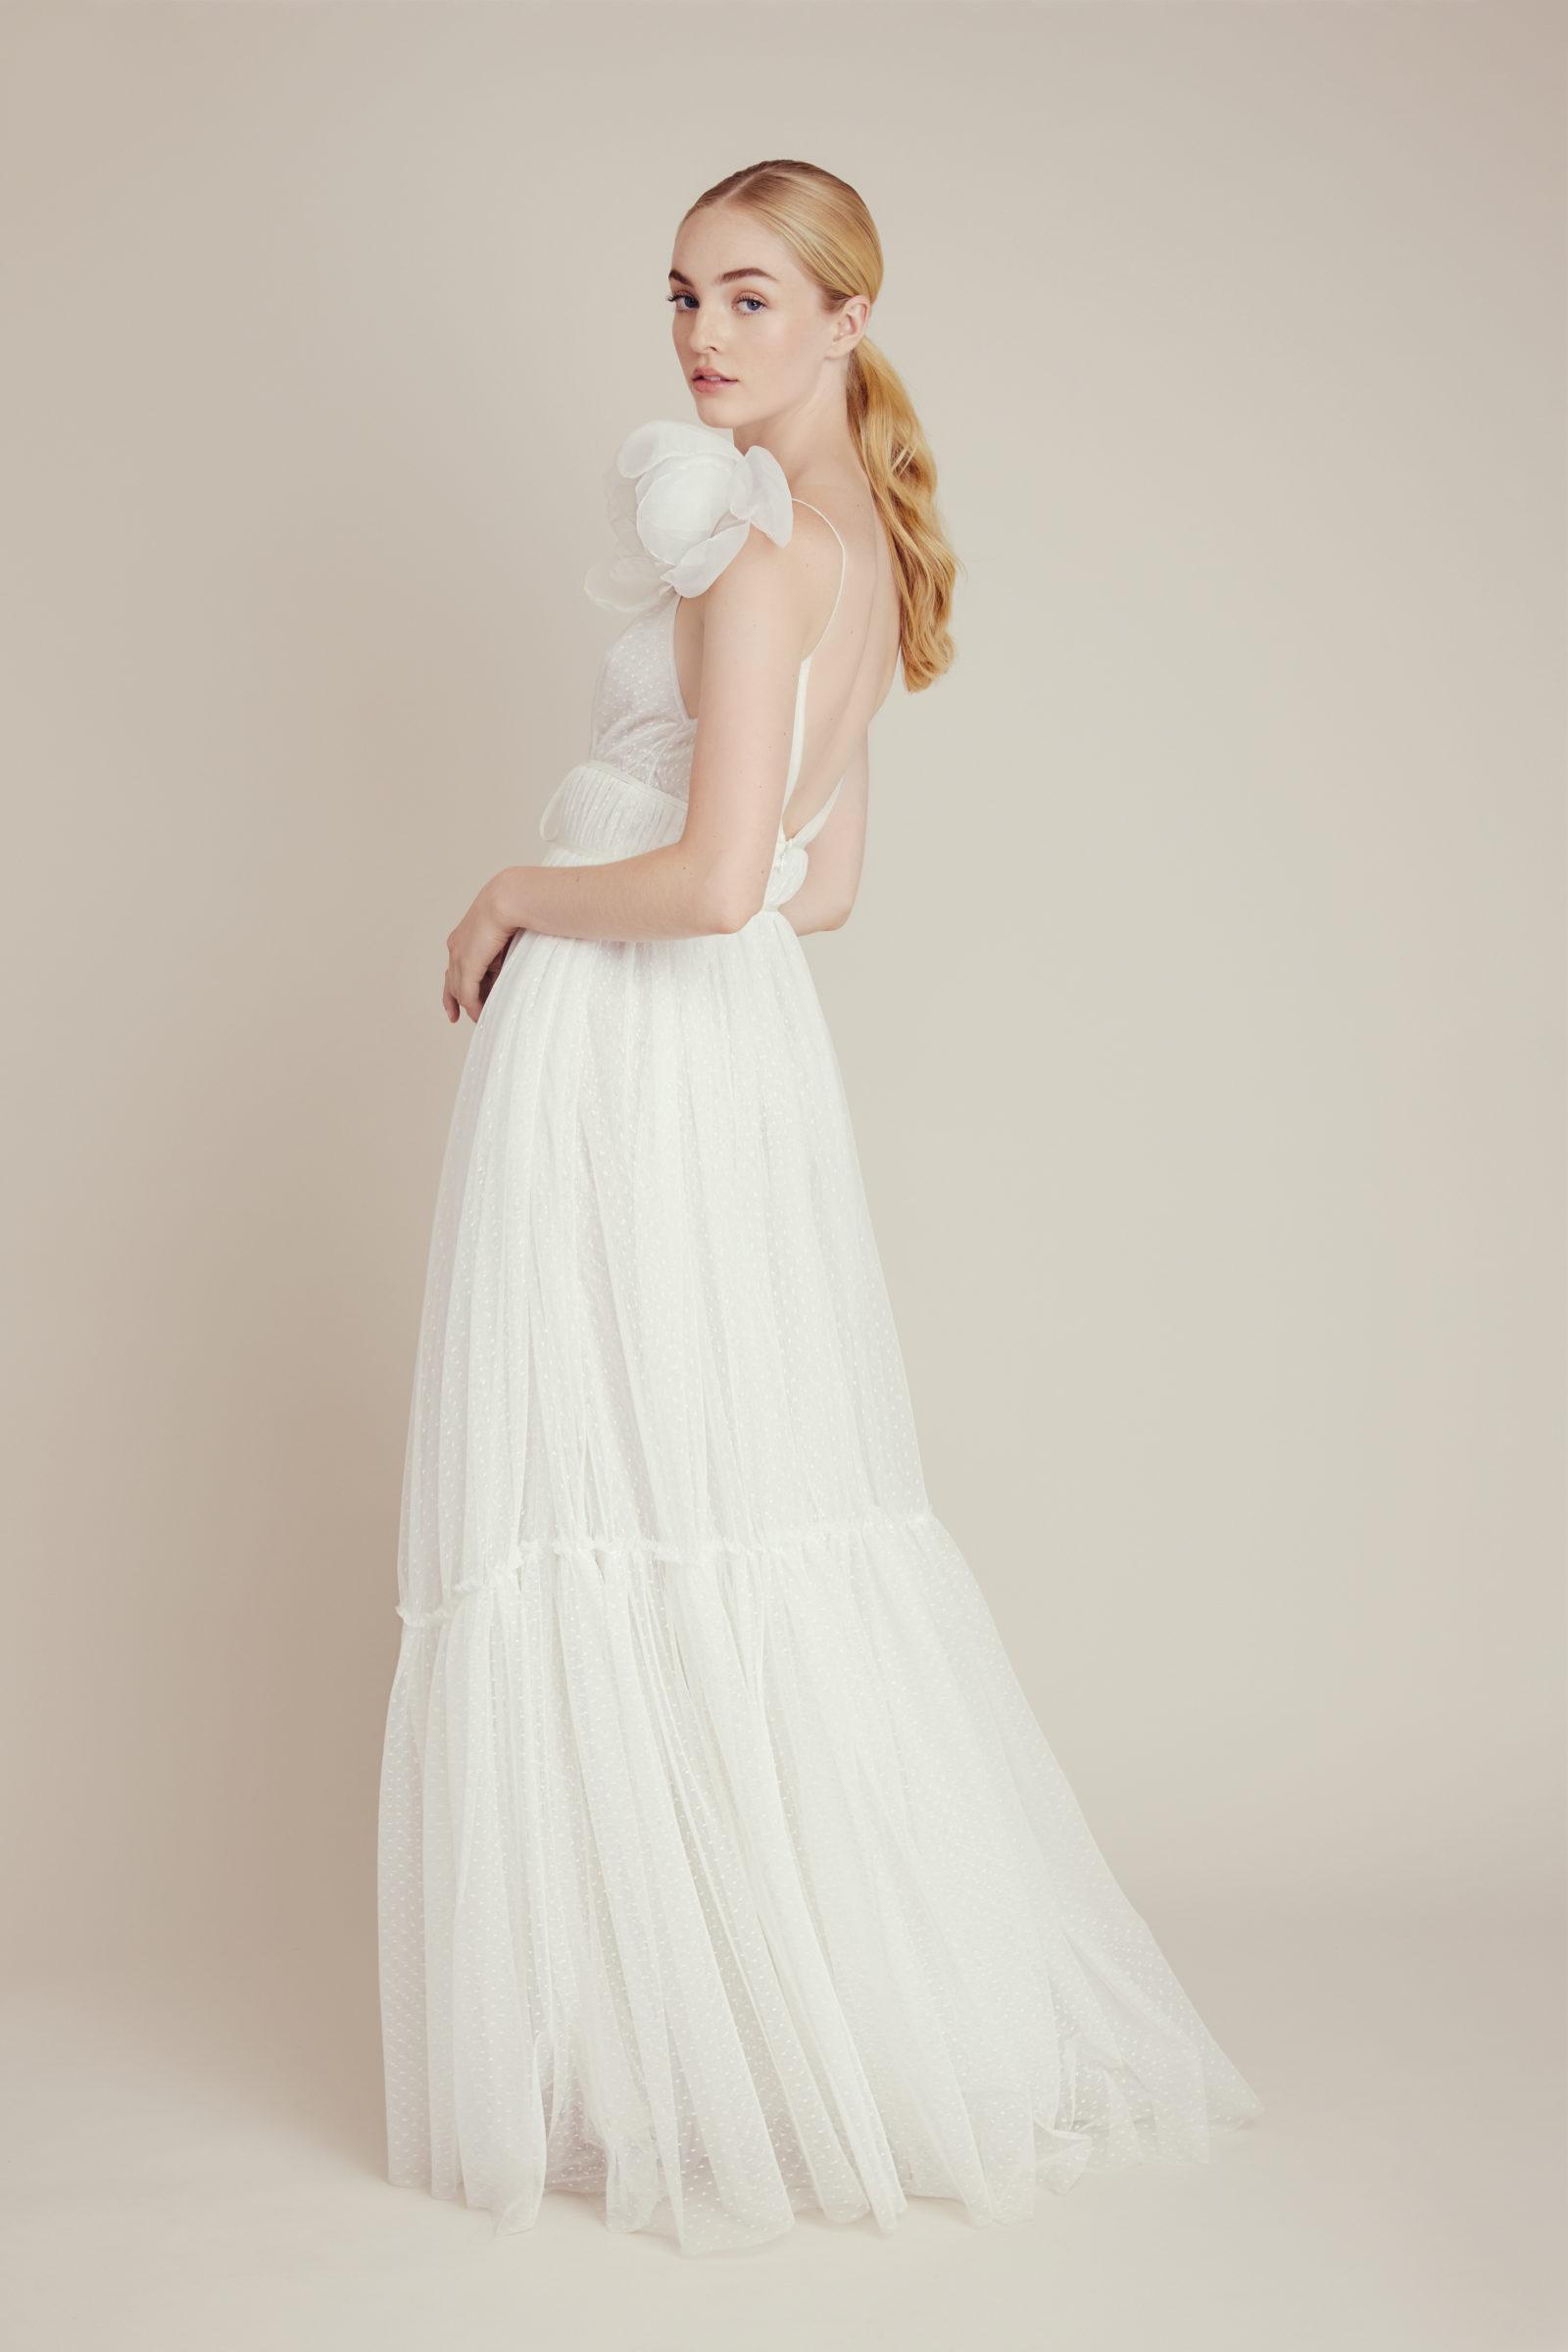 Lela Rose bridal gown